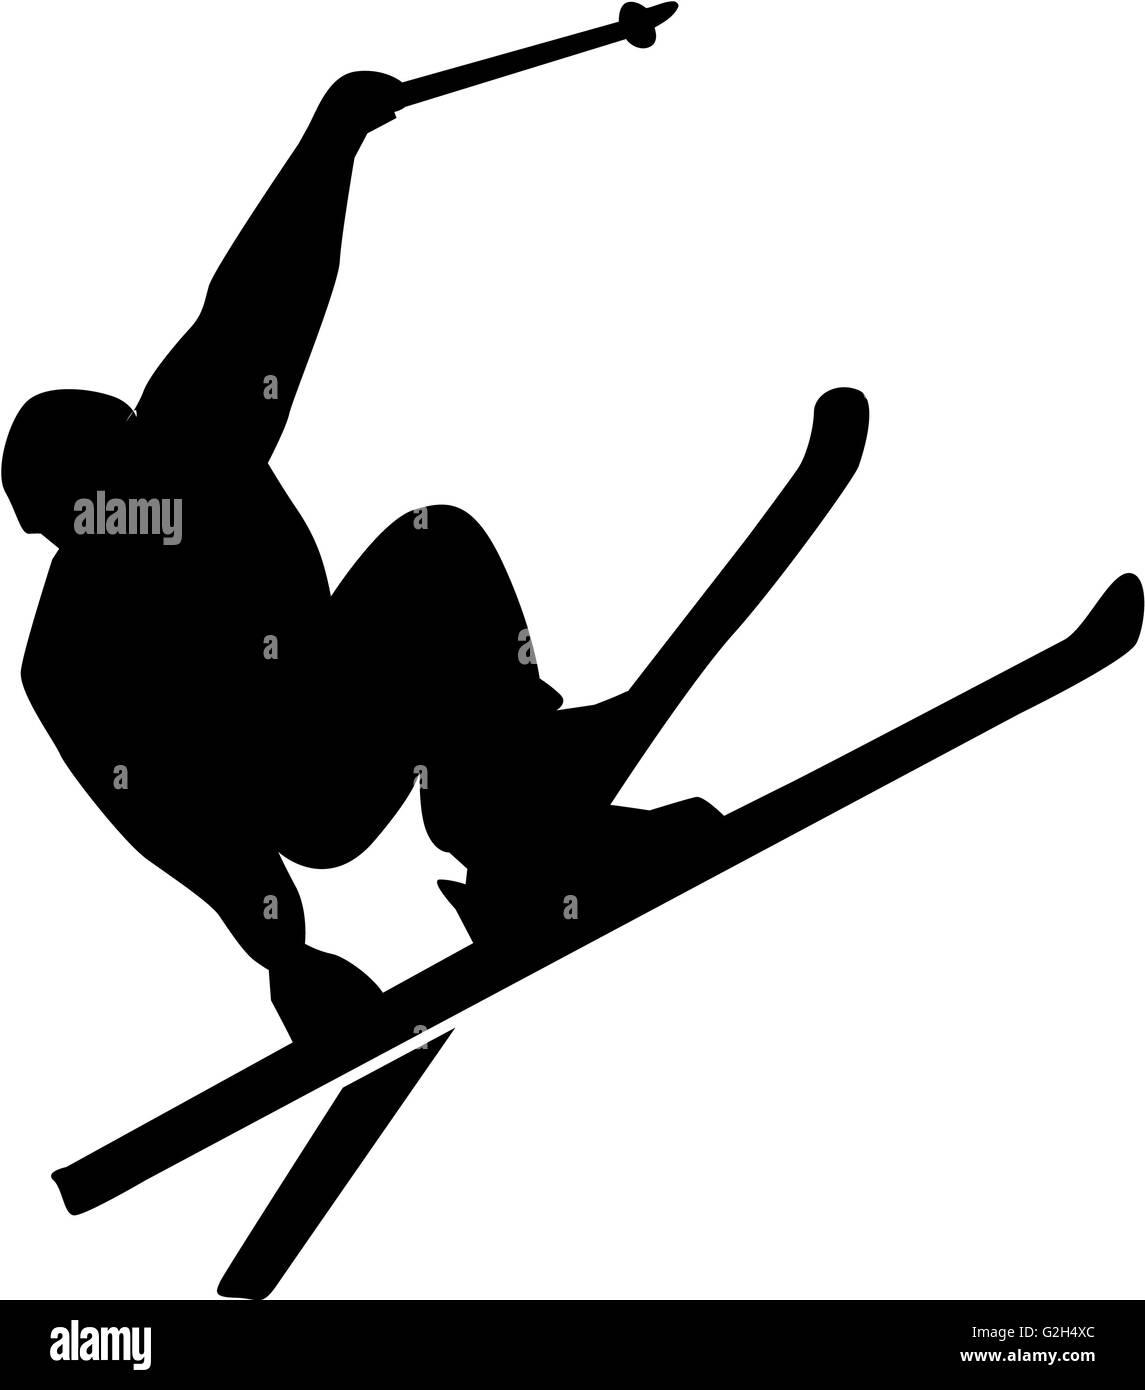 Ski Stunt Silhouette - Stock Image